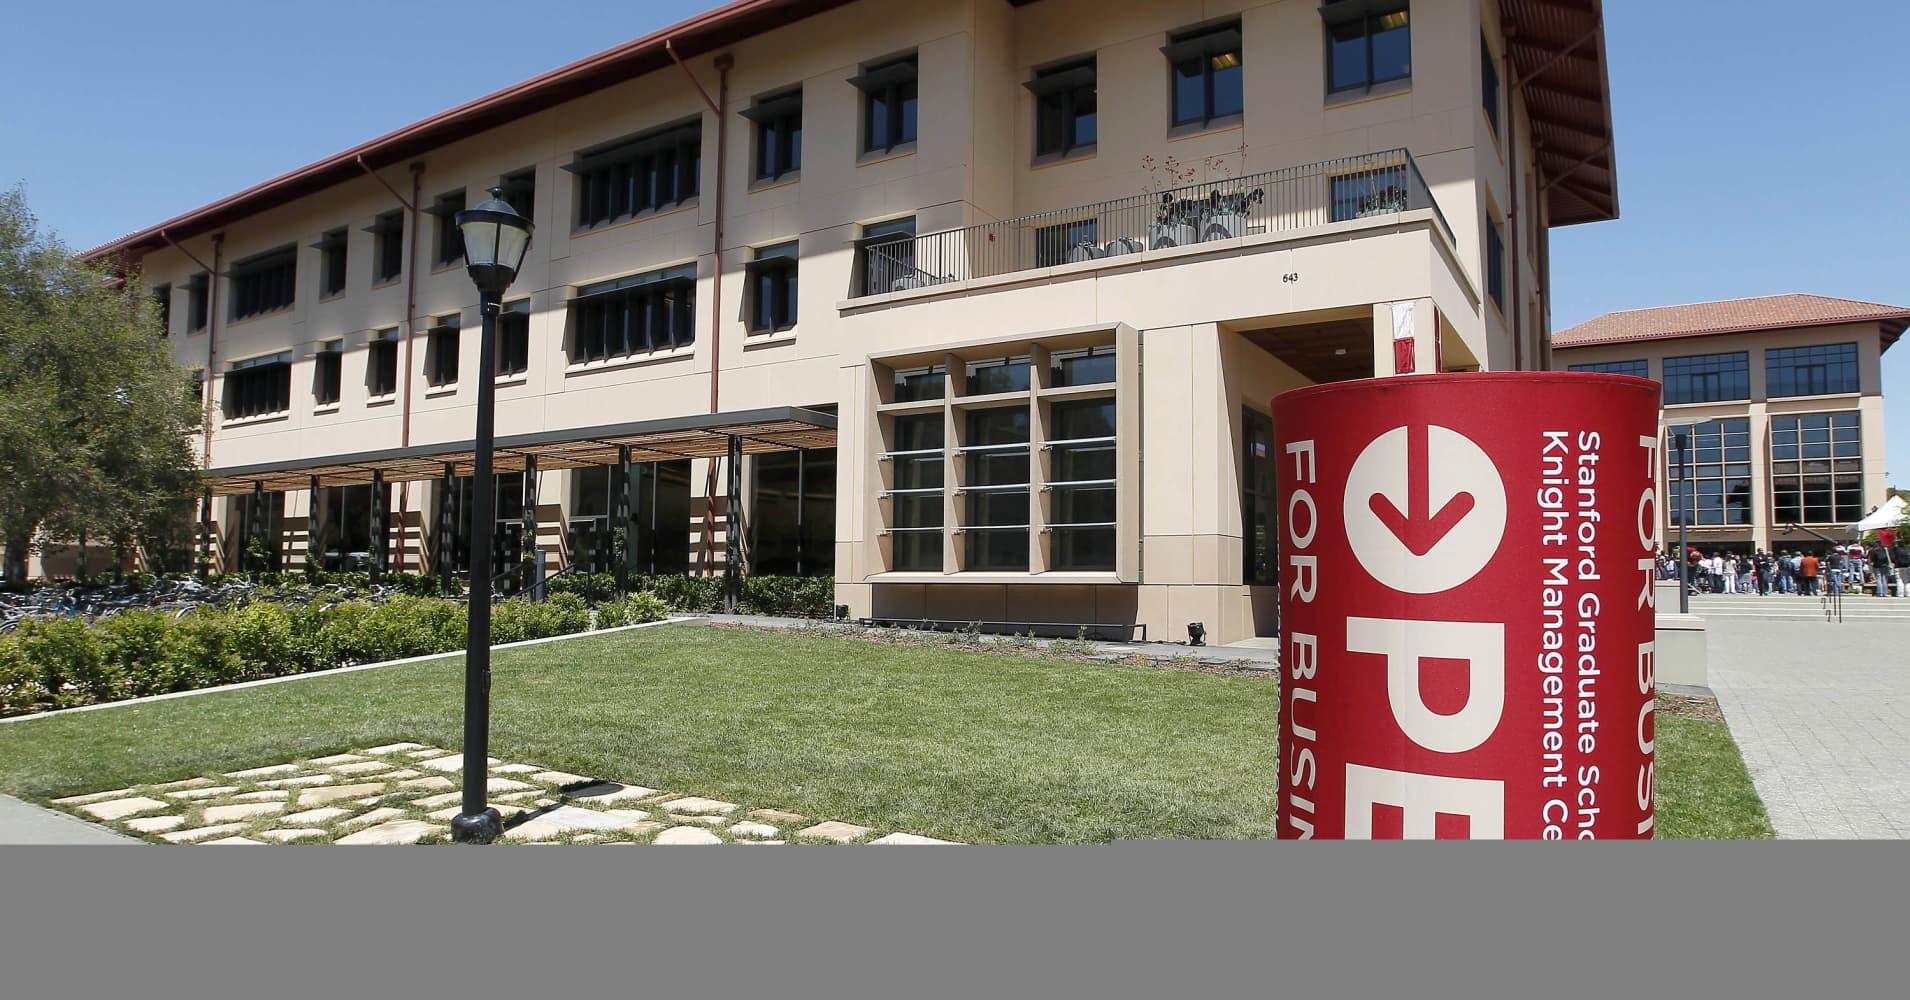 The Stanford Graduate School of Business in Palo Alto, California.